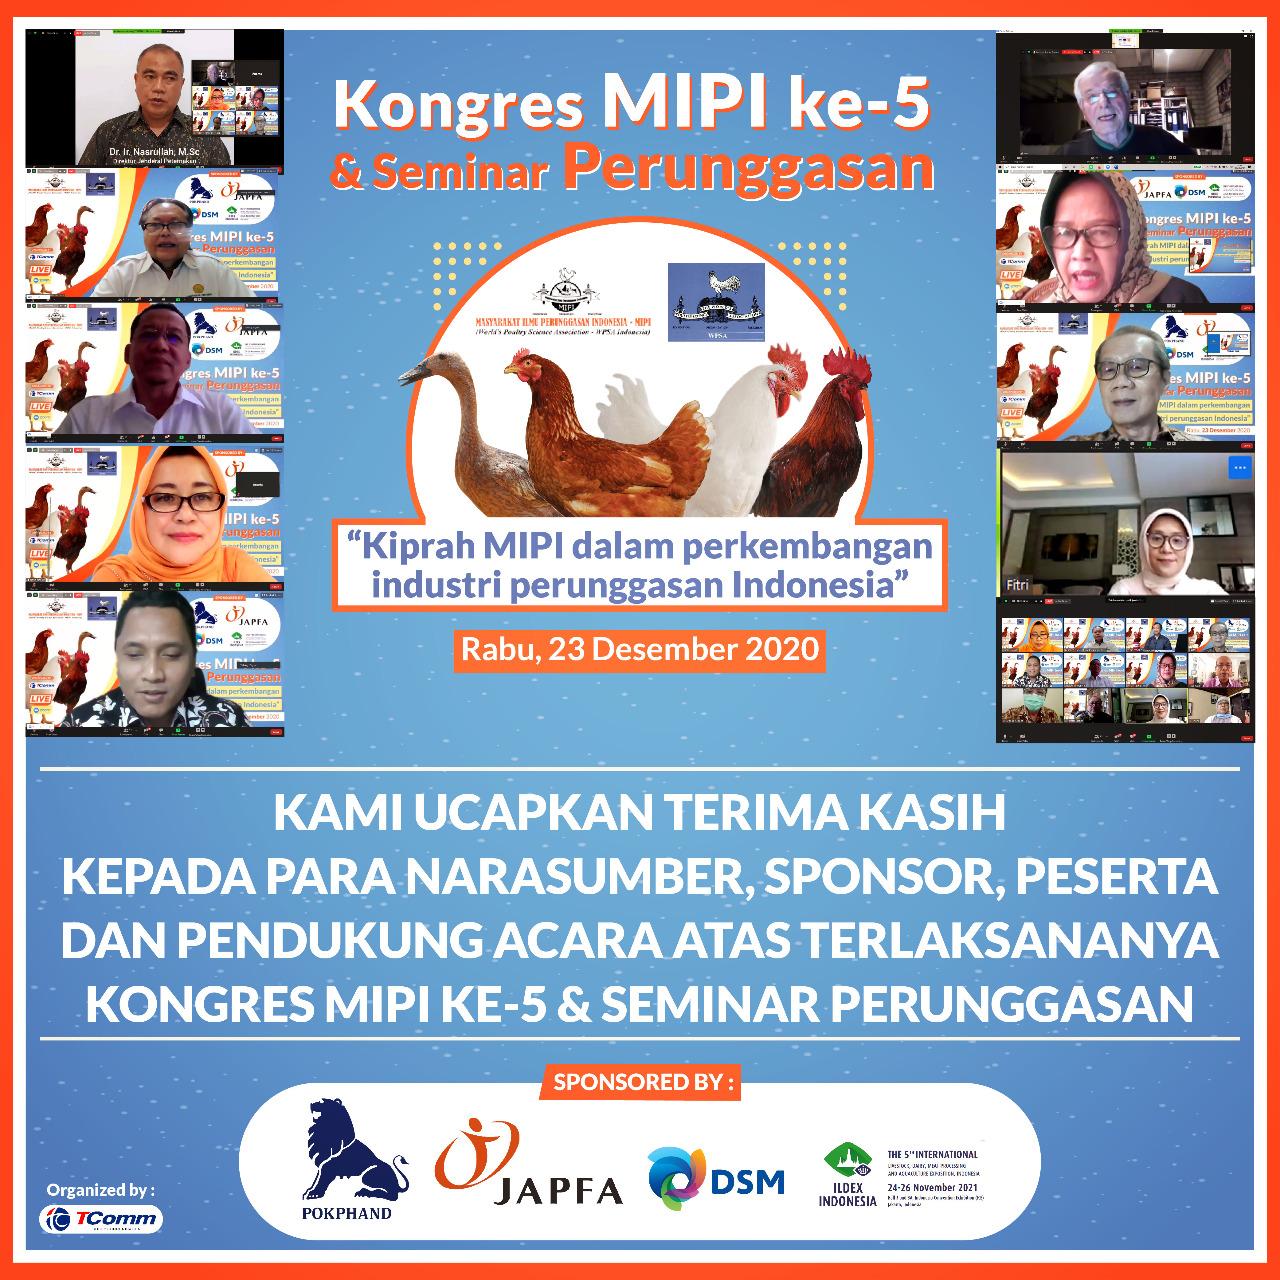 Kongres MIPI ke-5 & Seminar Perunggasan